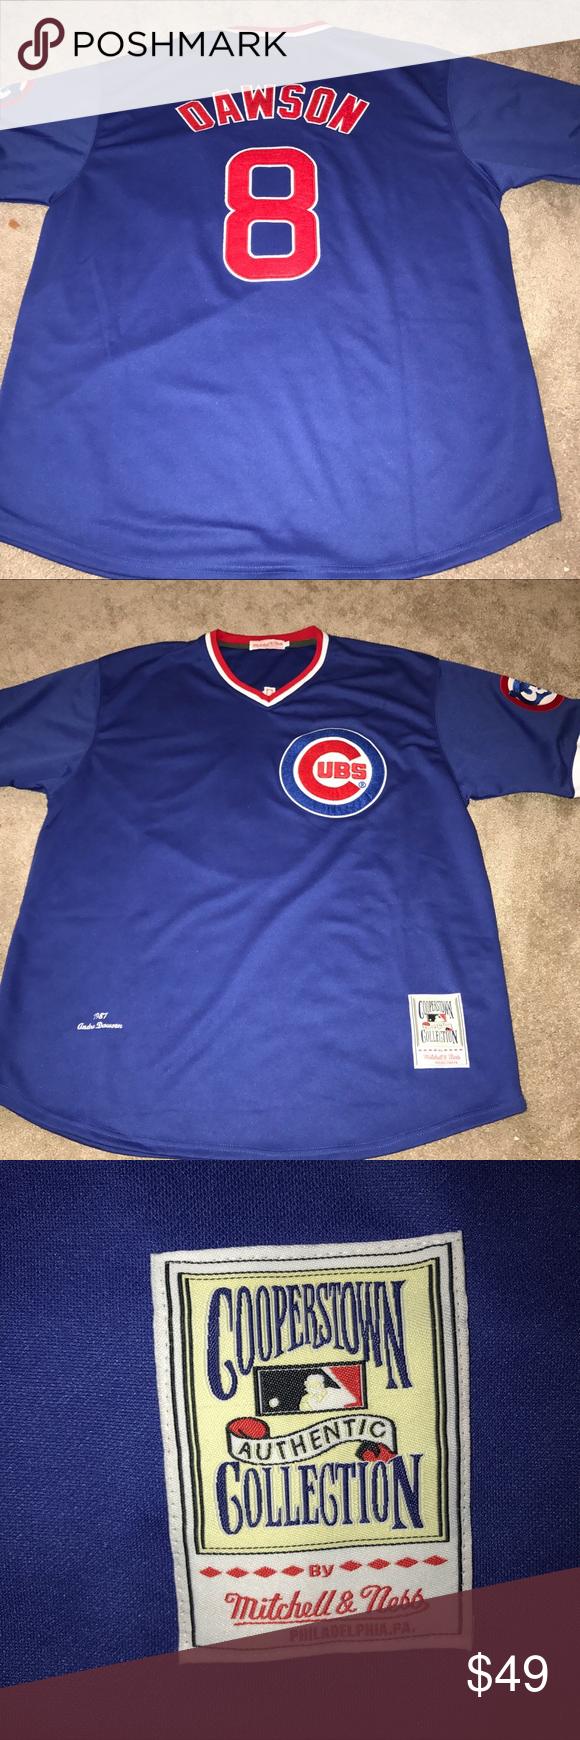 e7ef8259c Chicago Cubs Andre Dawson 1987 Throwback jersey 2X Chicago Cubs 1987 Andre  Dawson Mitchell &